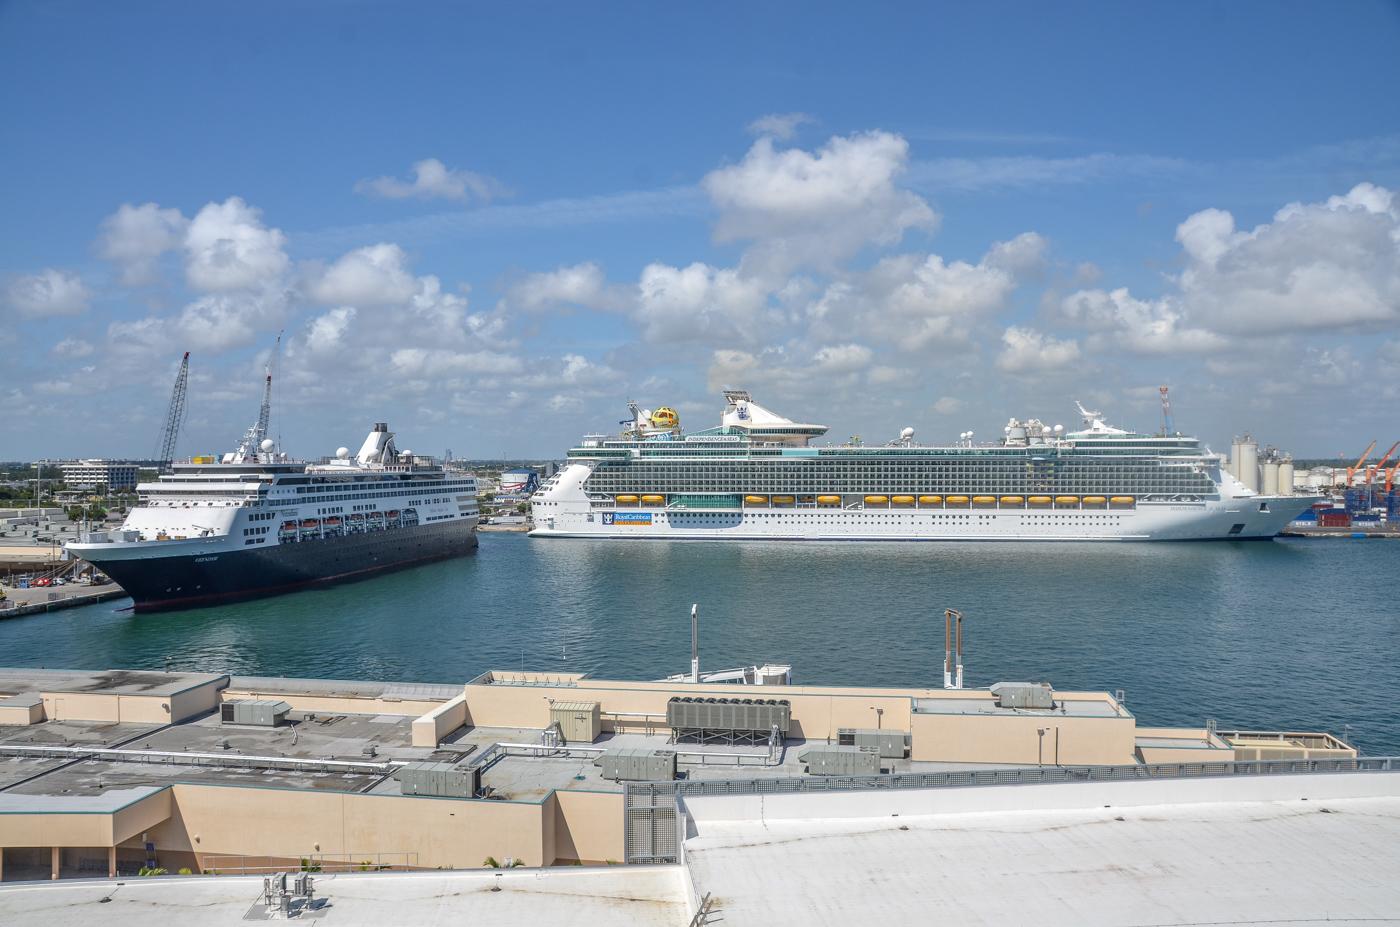 royal caribbean and holland america